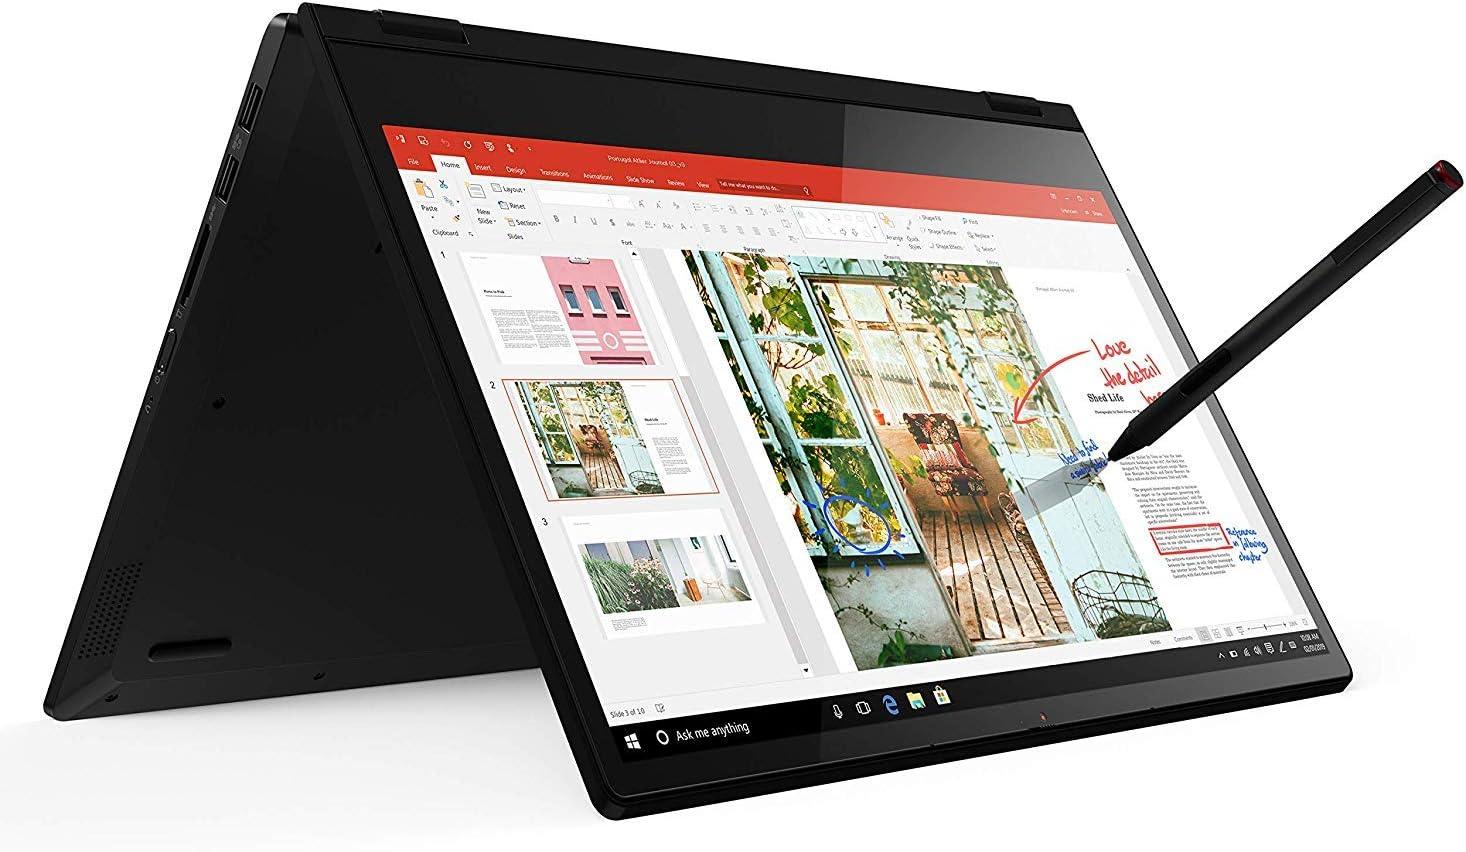 2019 Lenovo Flex 6 14 Inch 2-in-1 Touchscreen FHD 1080P Laptop (8th Gen Inter 4-Core i7-8550U up to 4.0GHz, 8GB DDR4 RAM, 256GB SSD, Intel HD Graphics 620, Backlit KB, WiFi, Bluetooth, Windows 10)